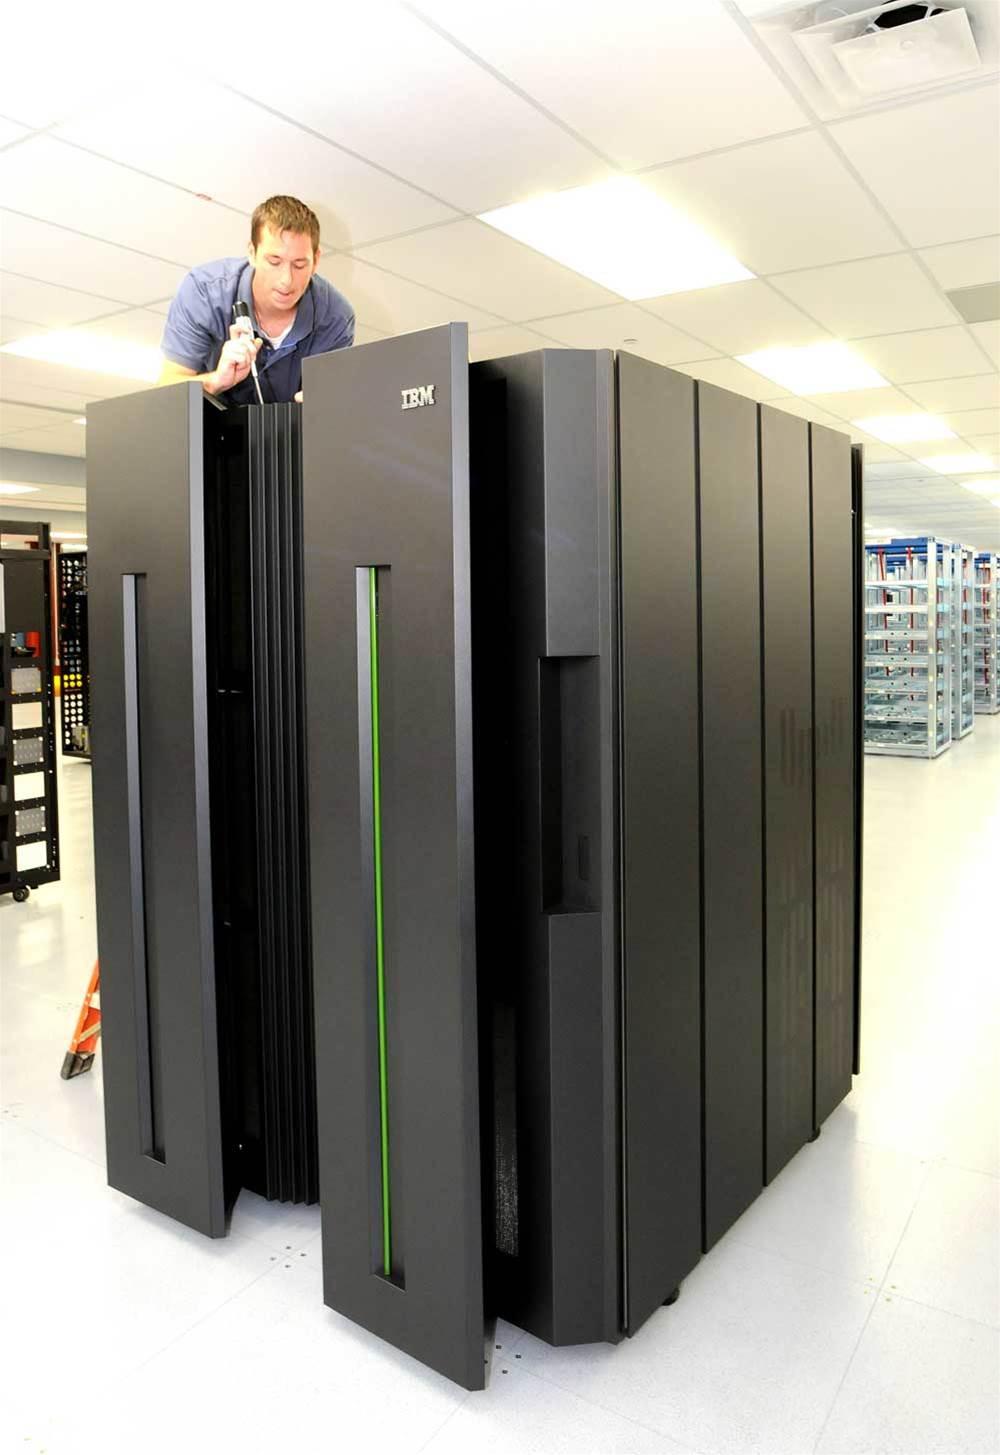 EC accuses IBM of mainframe market abuse